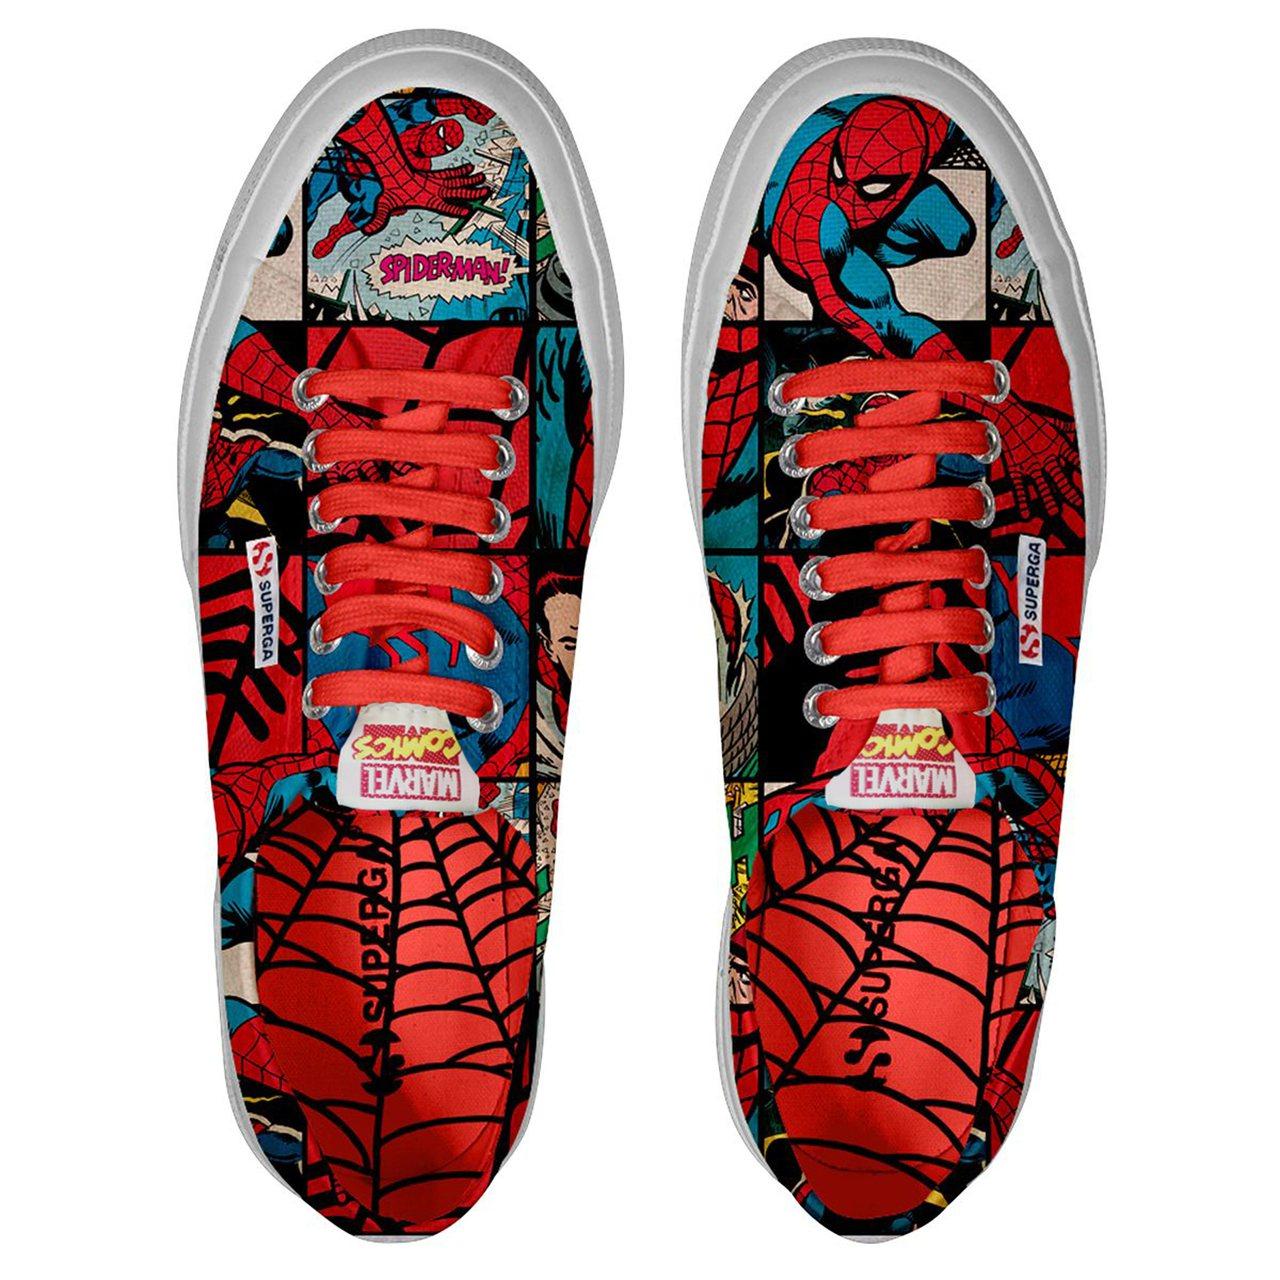 Superga 2750 Marvel限量聯名鞋,蜘蛛人款約2,780元。圖/嵥...